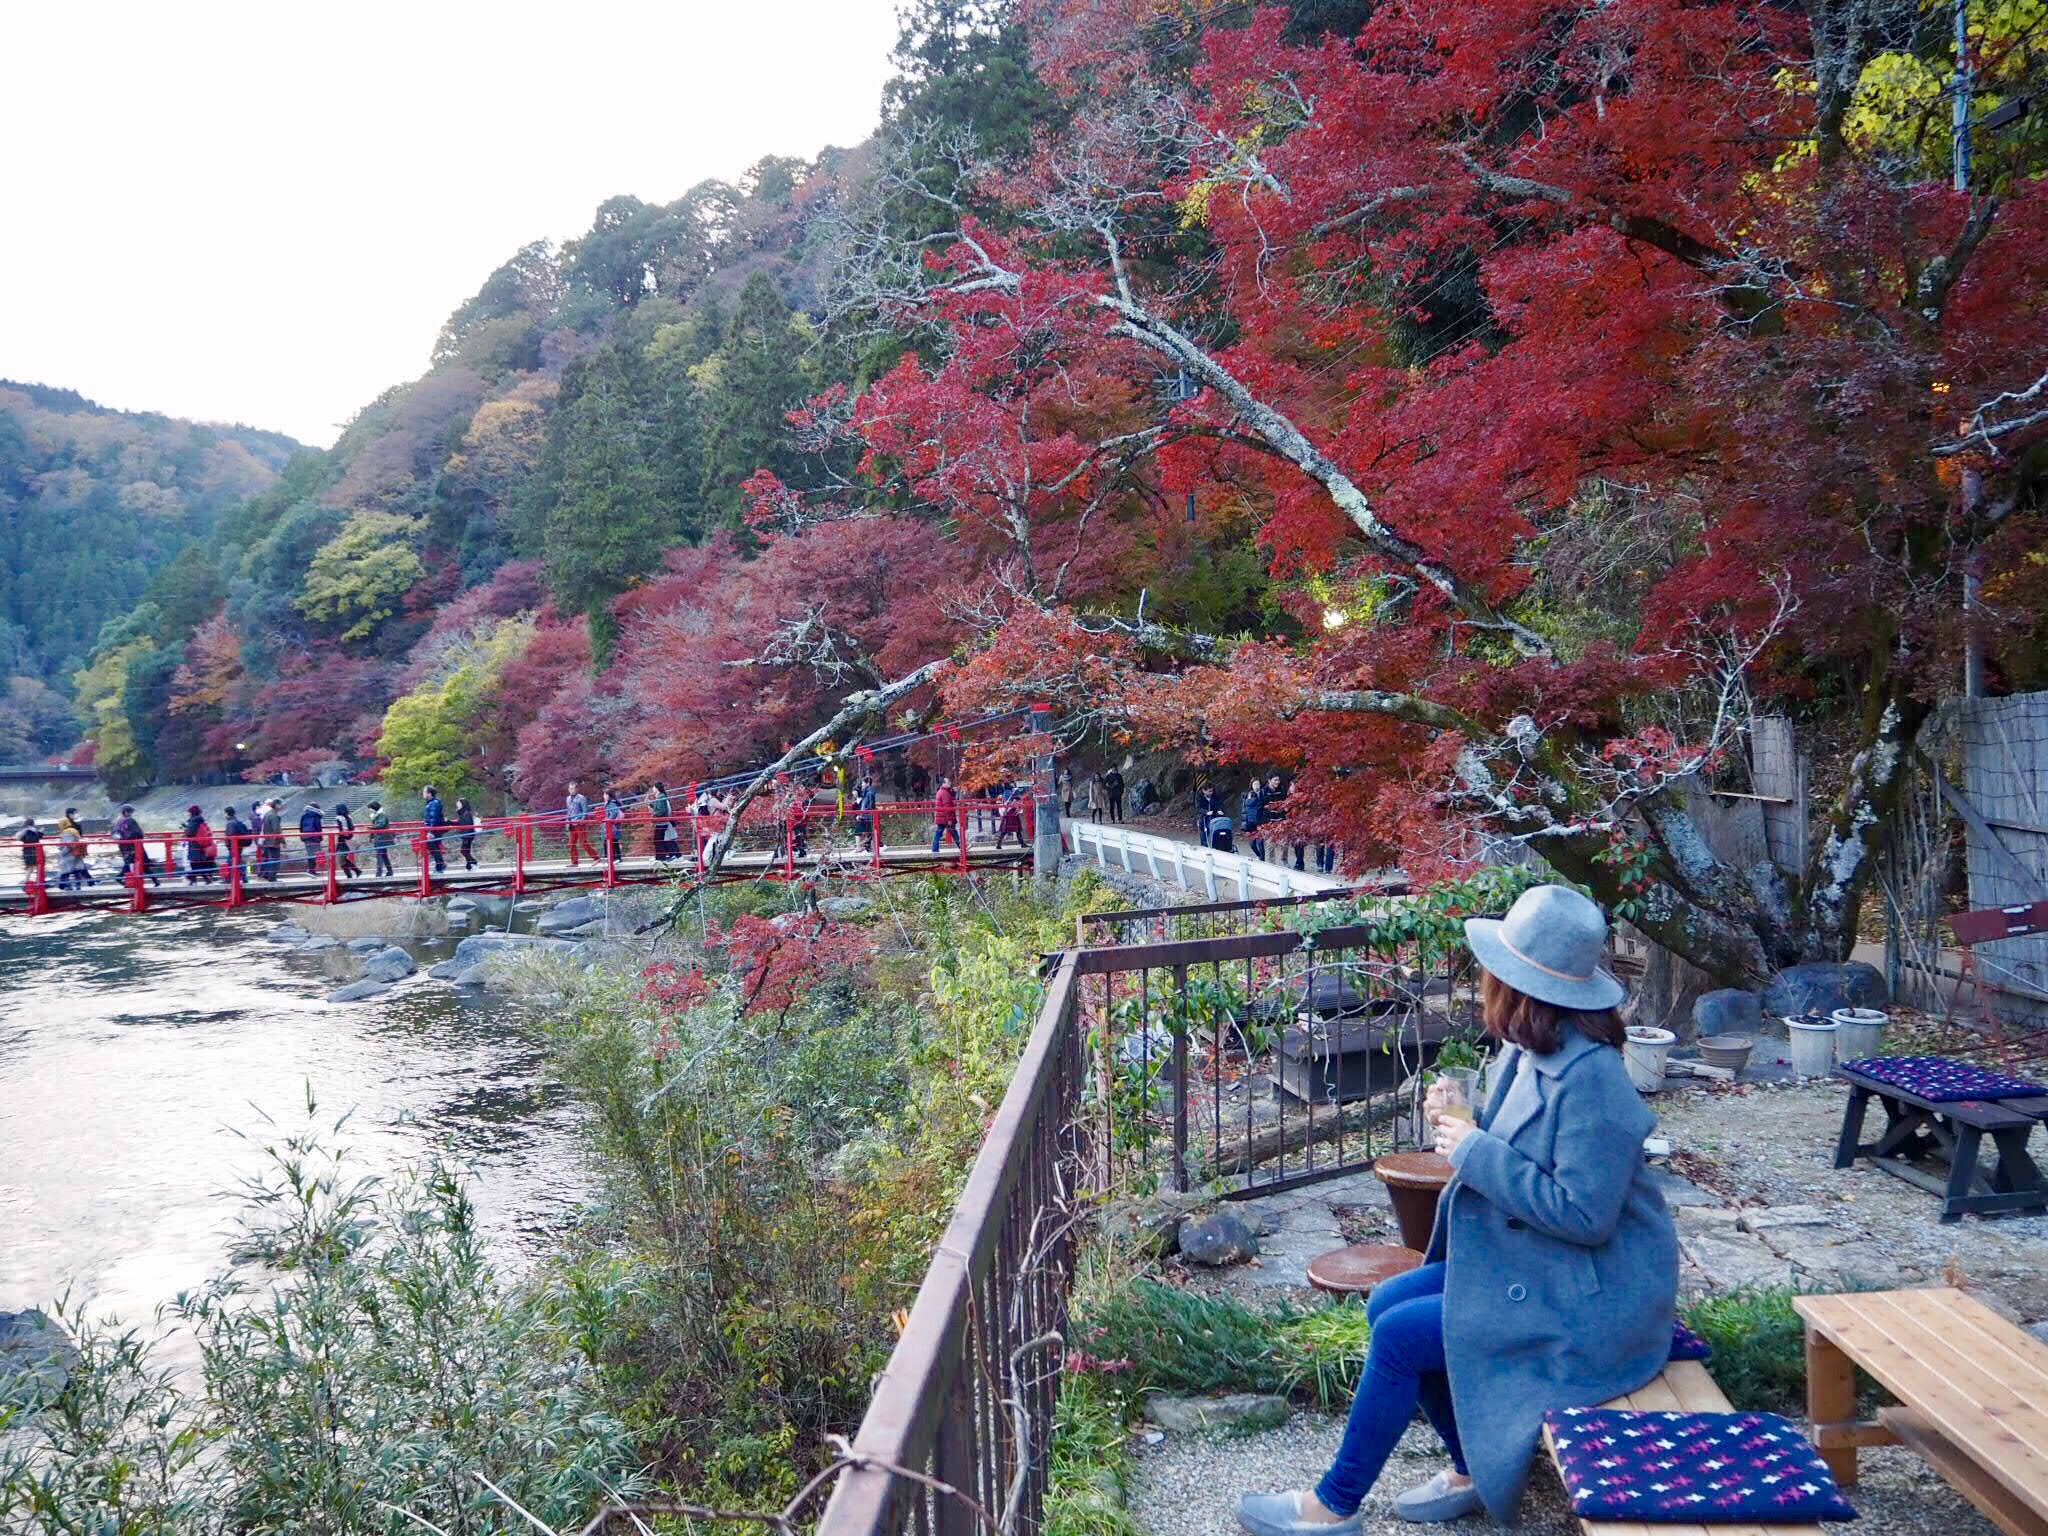 img 7553 - 香嵐渓 - 日本の秋を感じる 愛知県豊田市の紅葉スポット